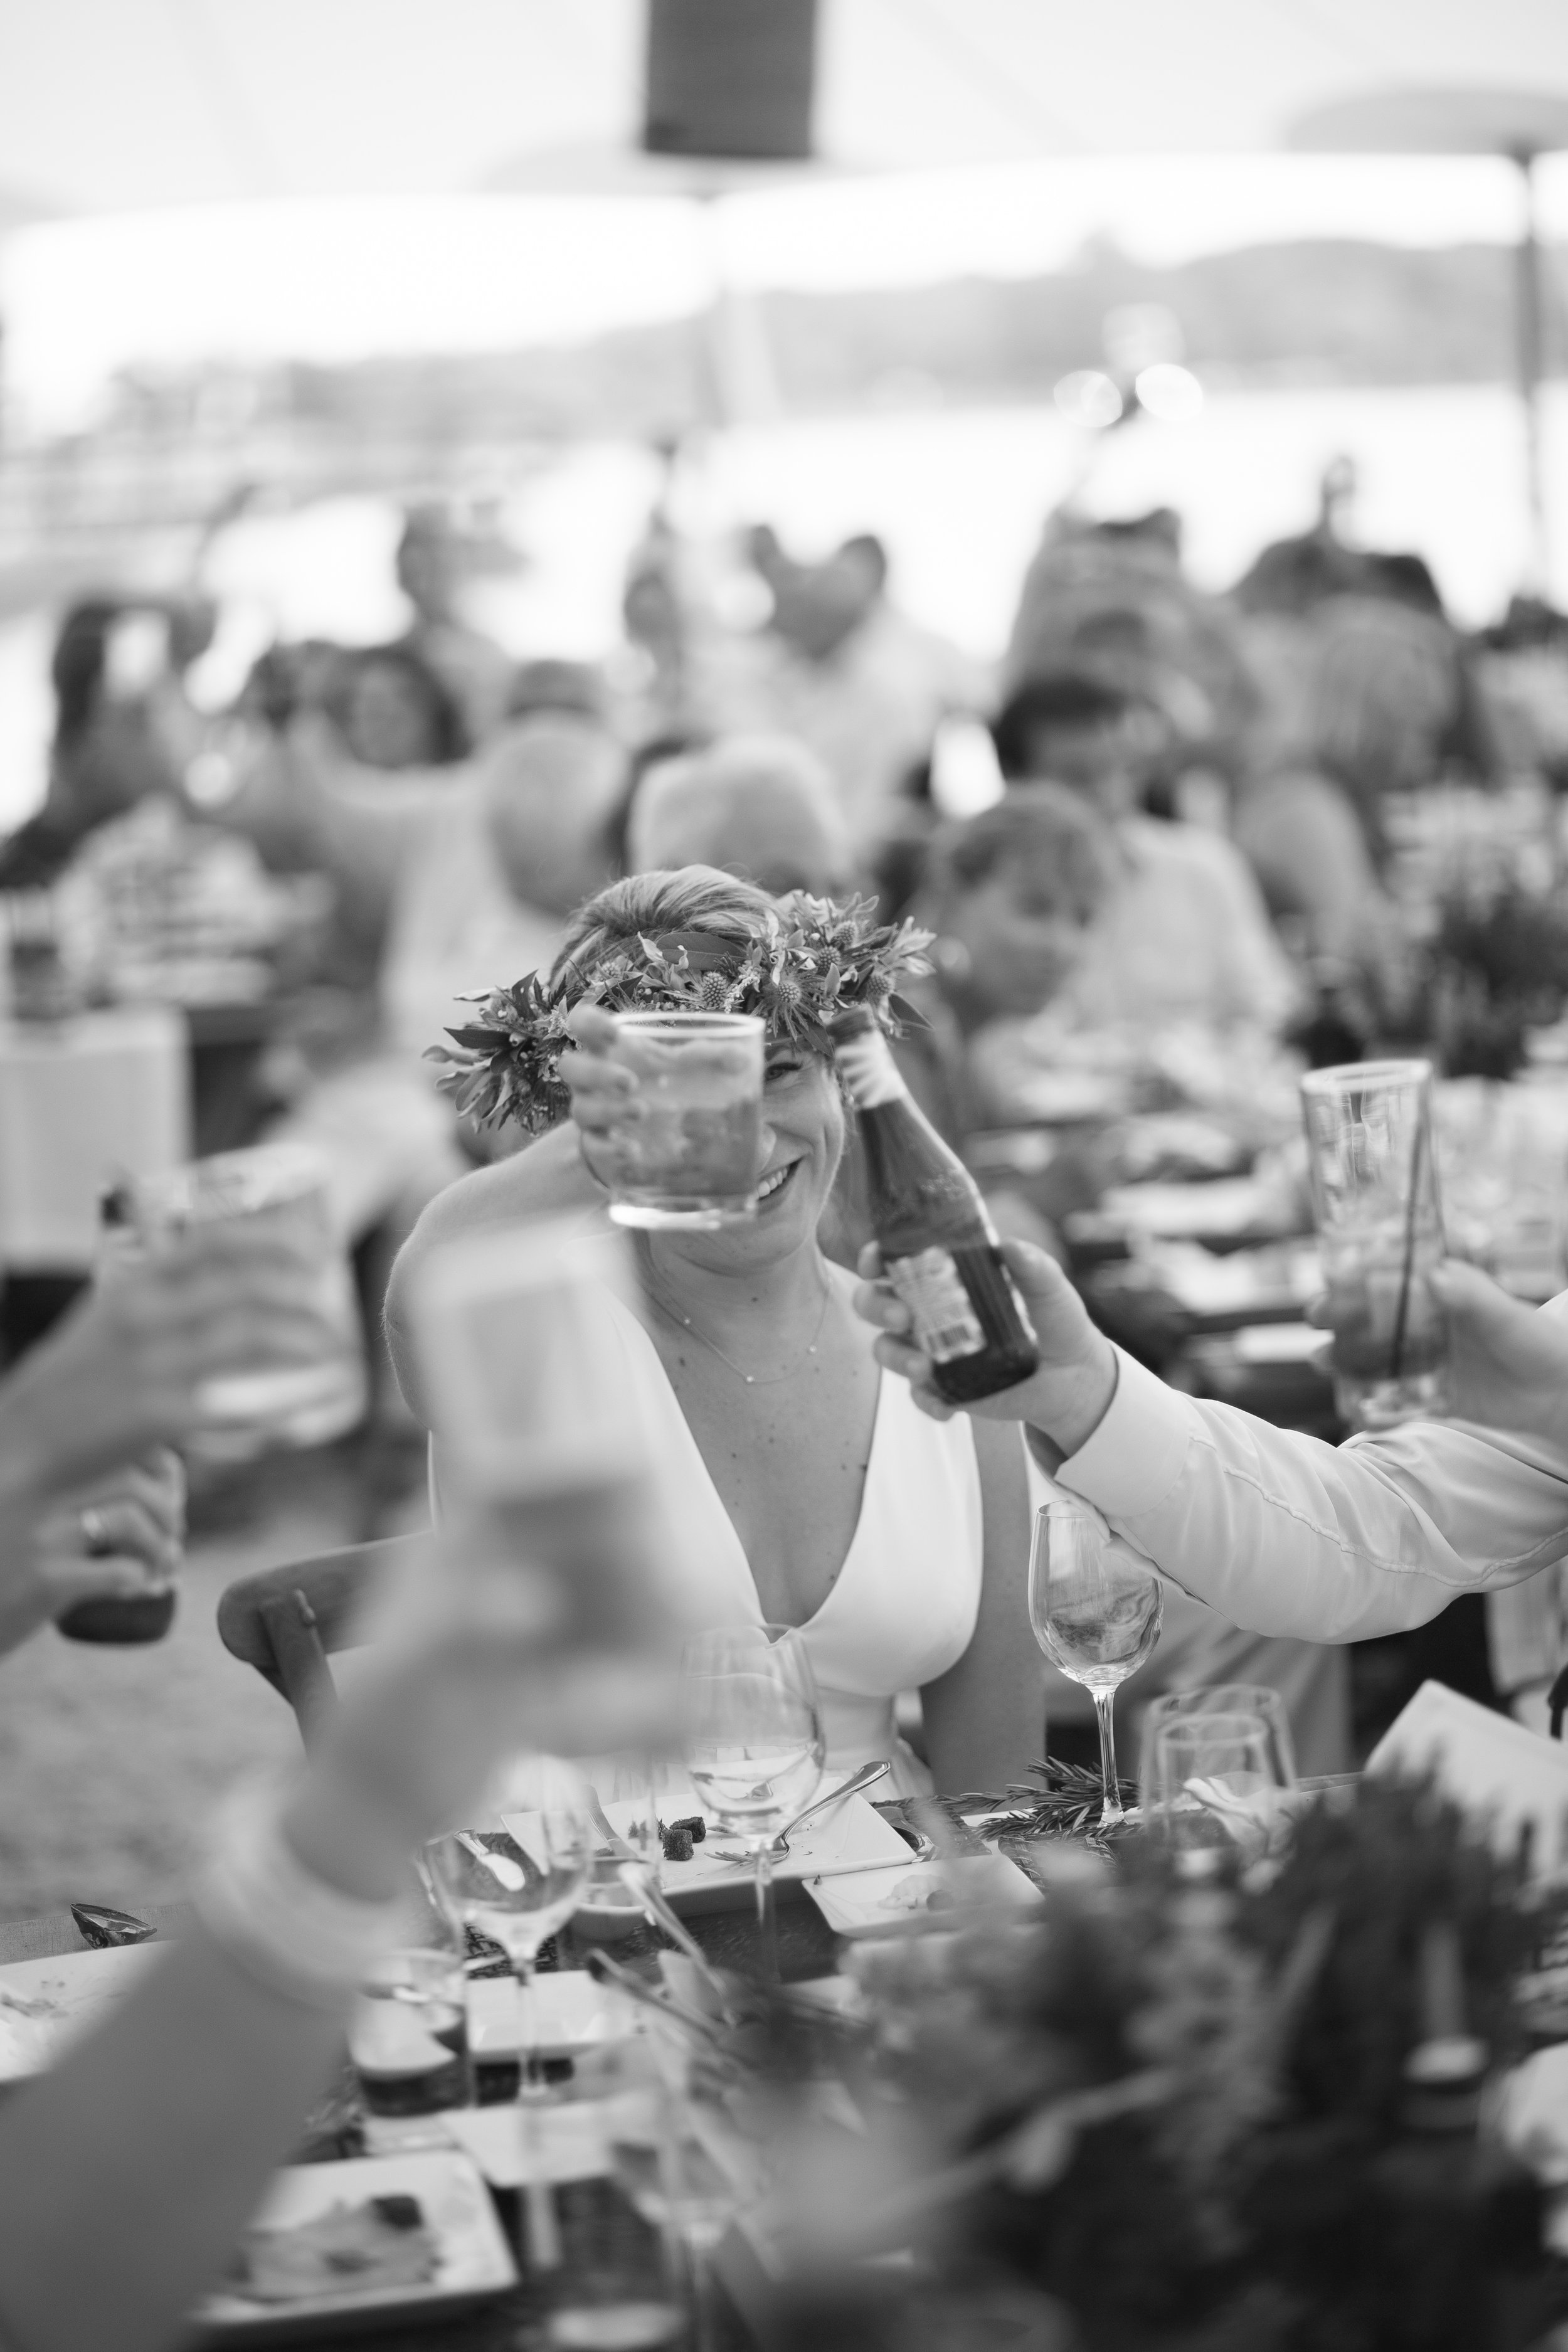 LUCAS POINT WEDDING OLD GREENWICH CONNECTICUT_018.jpg